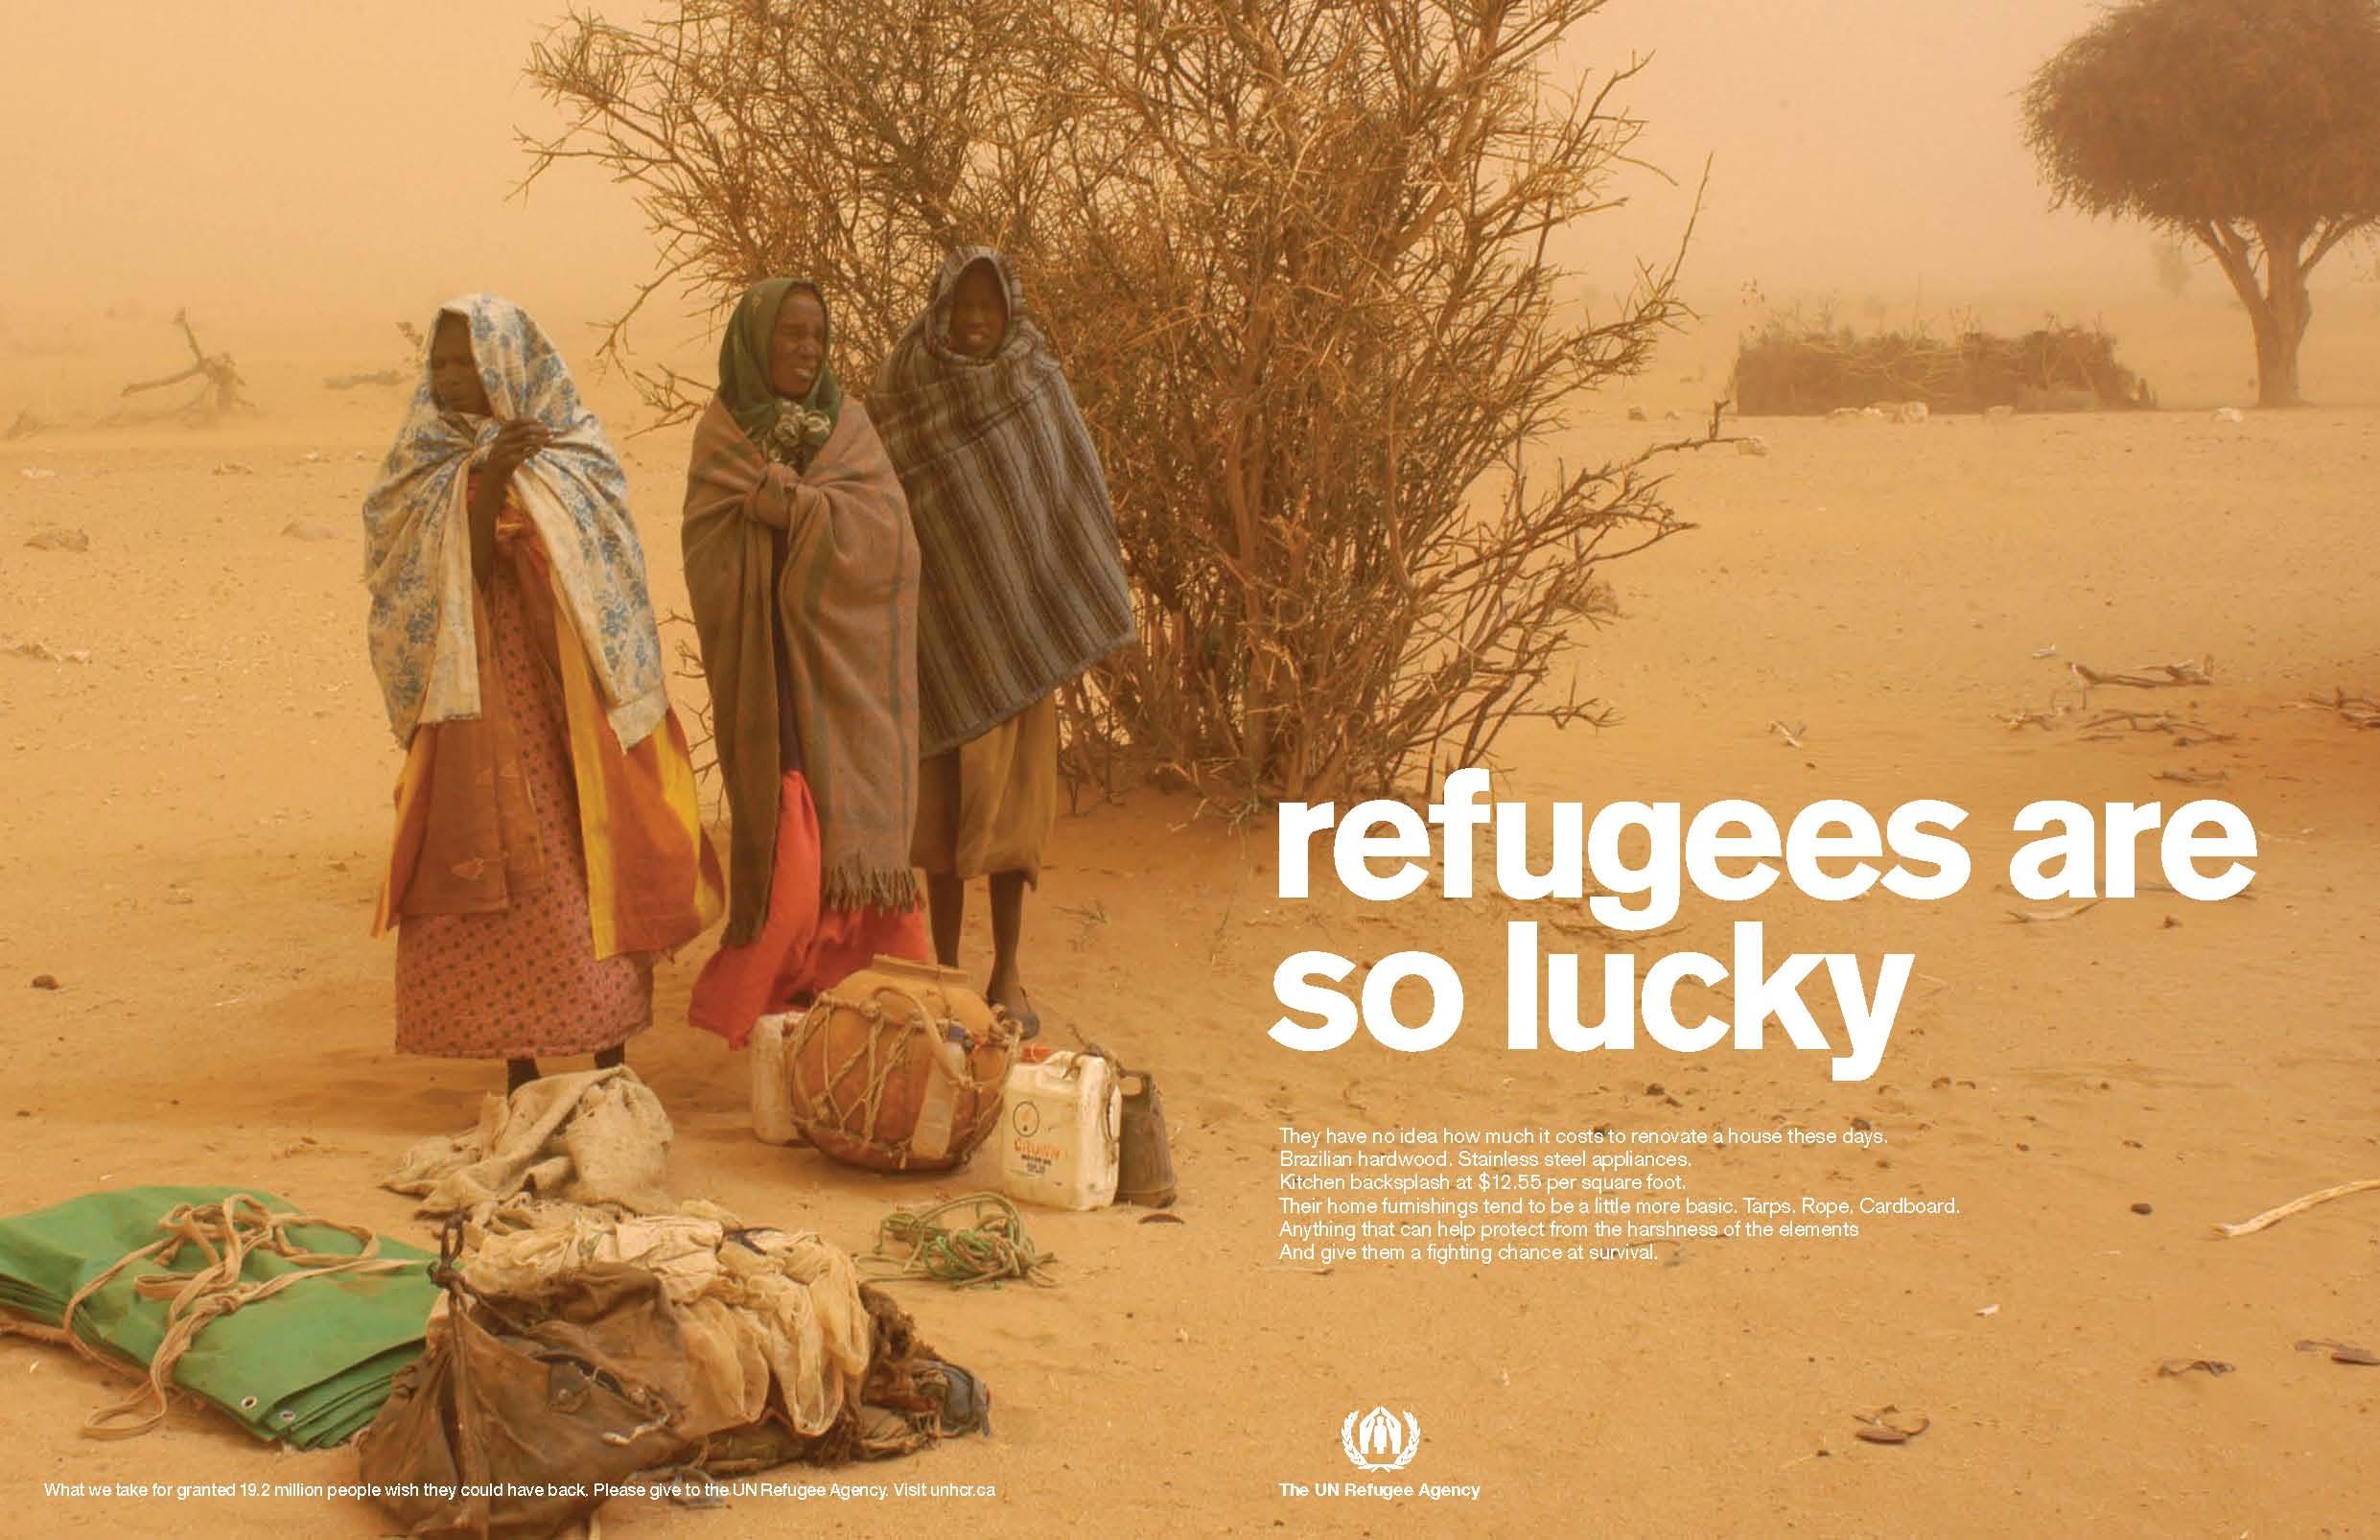 19.03.2014 – UNHCR – Comments on new report on Cyprus by Amnesty International – Σχόλια της Ύπατης Αρμοστείας αναφορικά με την Έκθεση της Διεθνούς Αμνηστείας για την Κύπρο